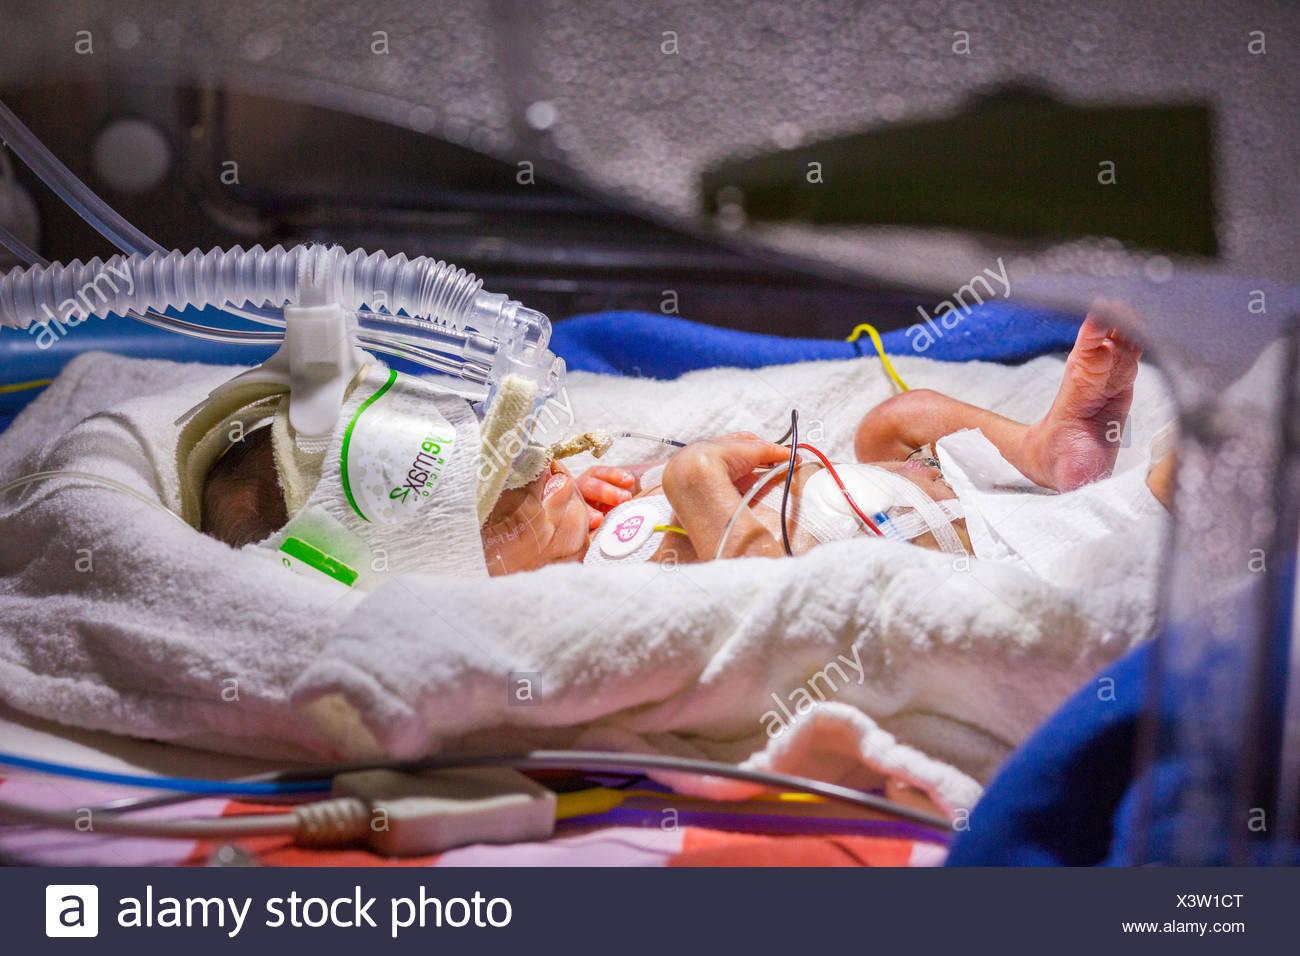 Premature newborn baby undergoing ultraviolet light treatment for jaundice. - Stock Image